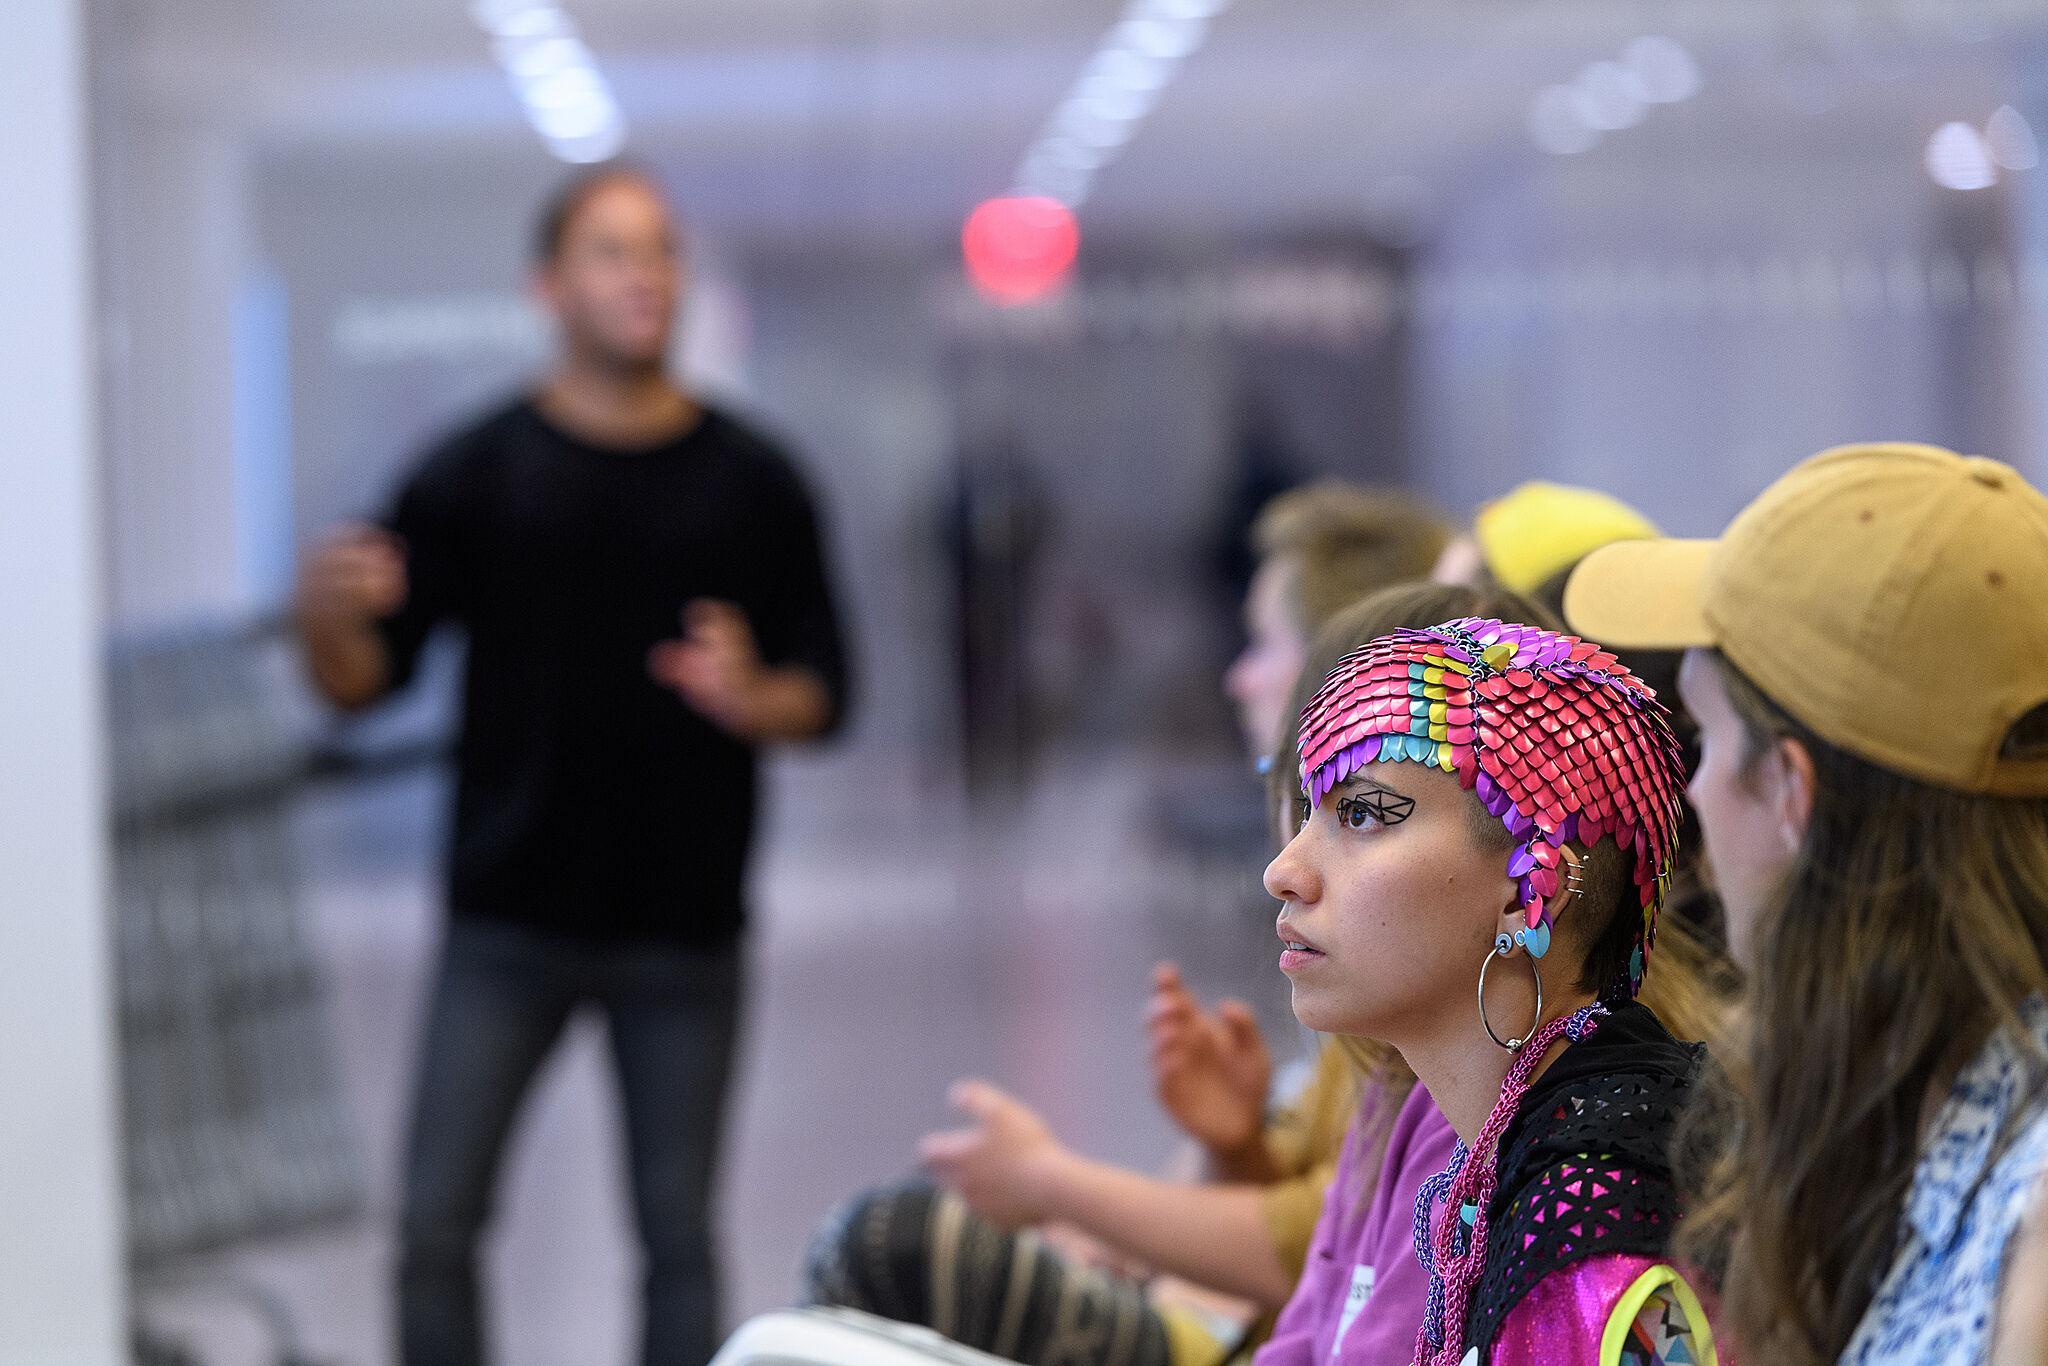 Attendees listen to a presentation.